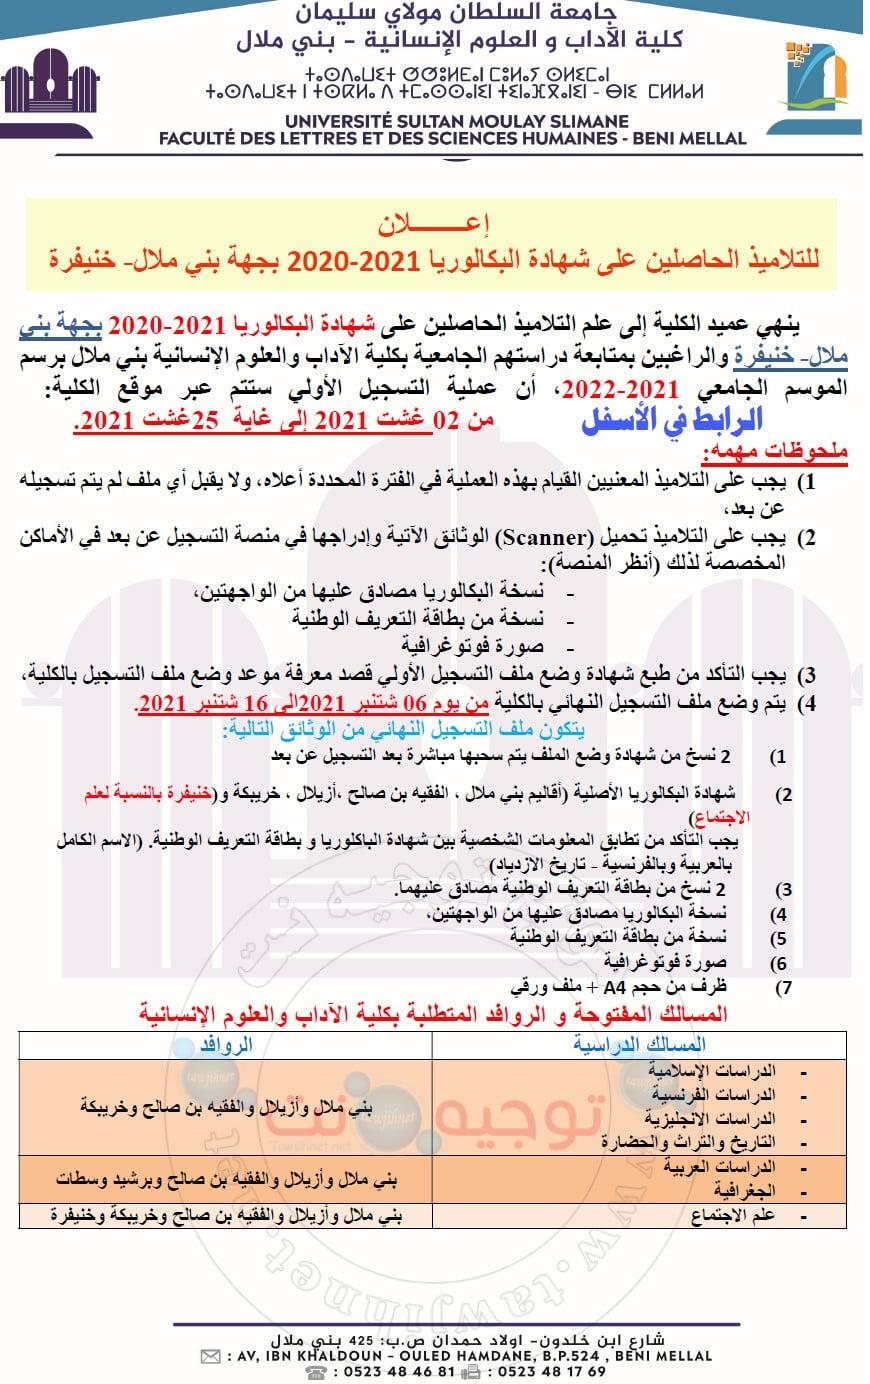 FLSH Beni Mellal Inscription Université Moulay Slimane Facultes Beni Mellal 2021 2022